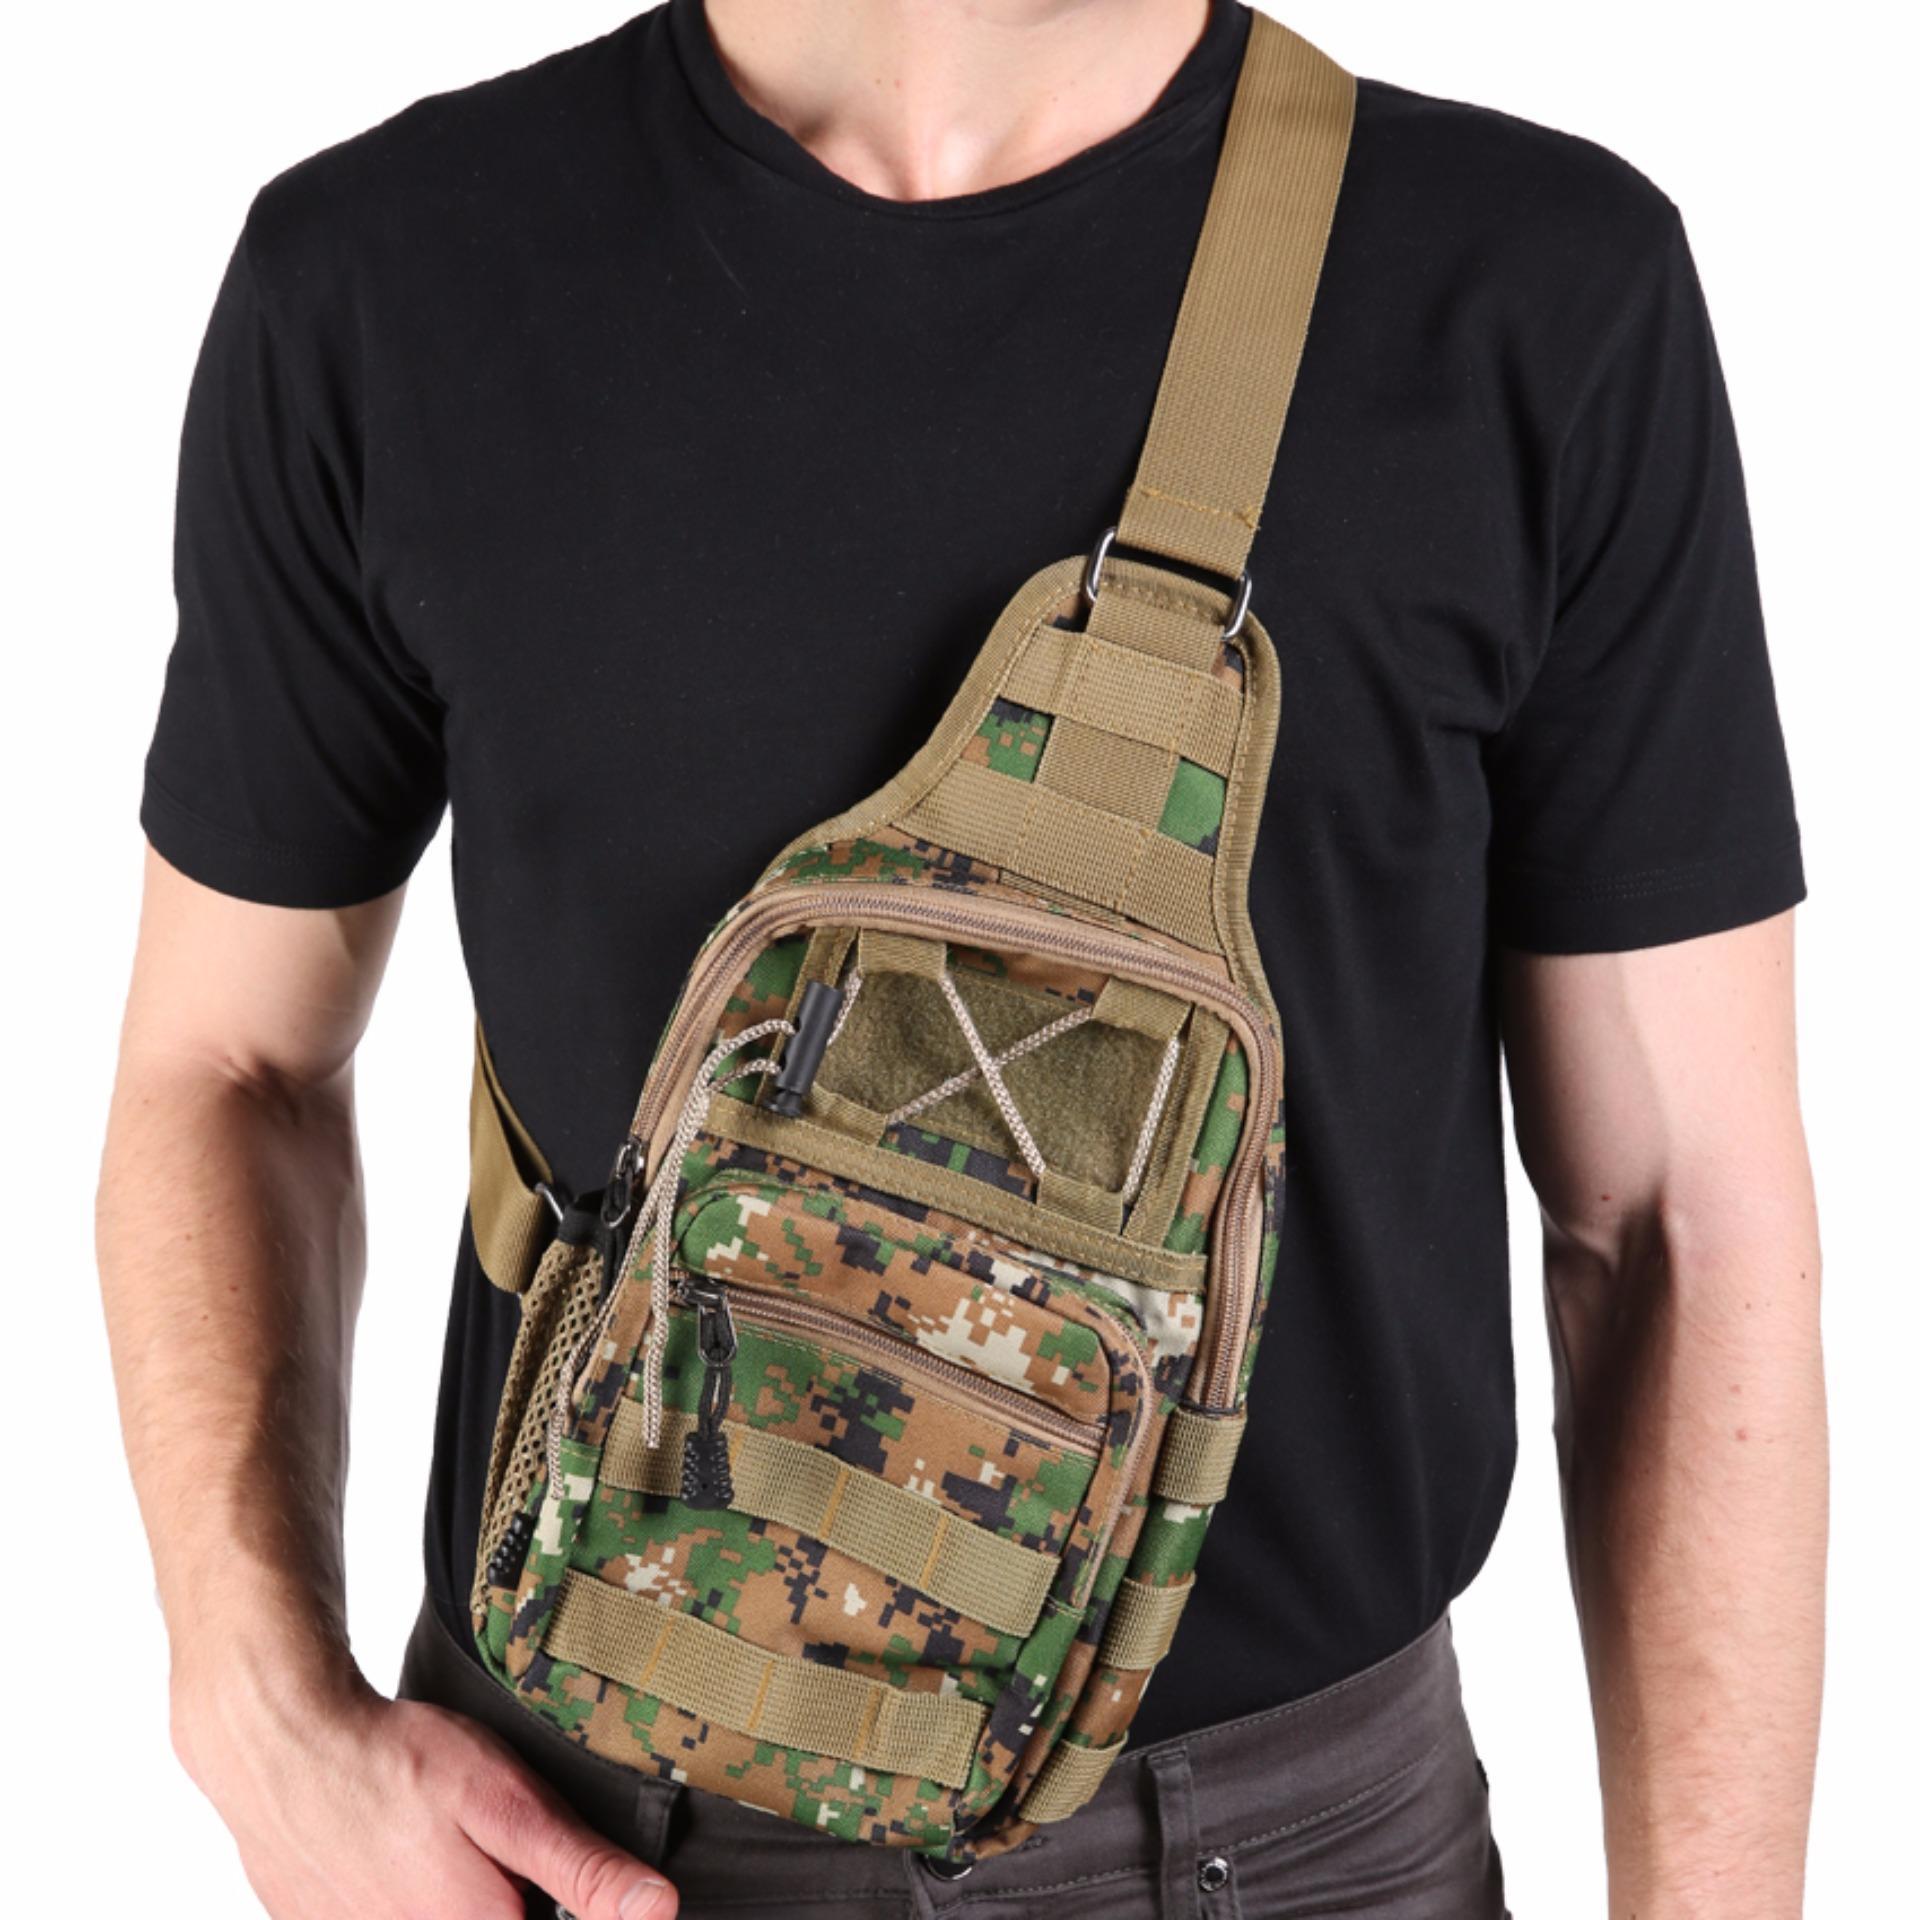 Harga Jcf Tas Selempang Import Cowok Pria Army Tactical Sling Waist Messenger Shoulder Bag Backpack Army Green 01 Yang Bagus